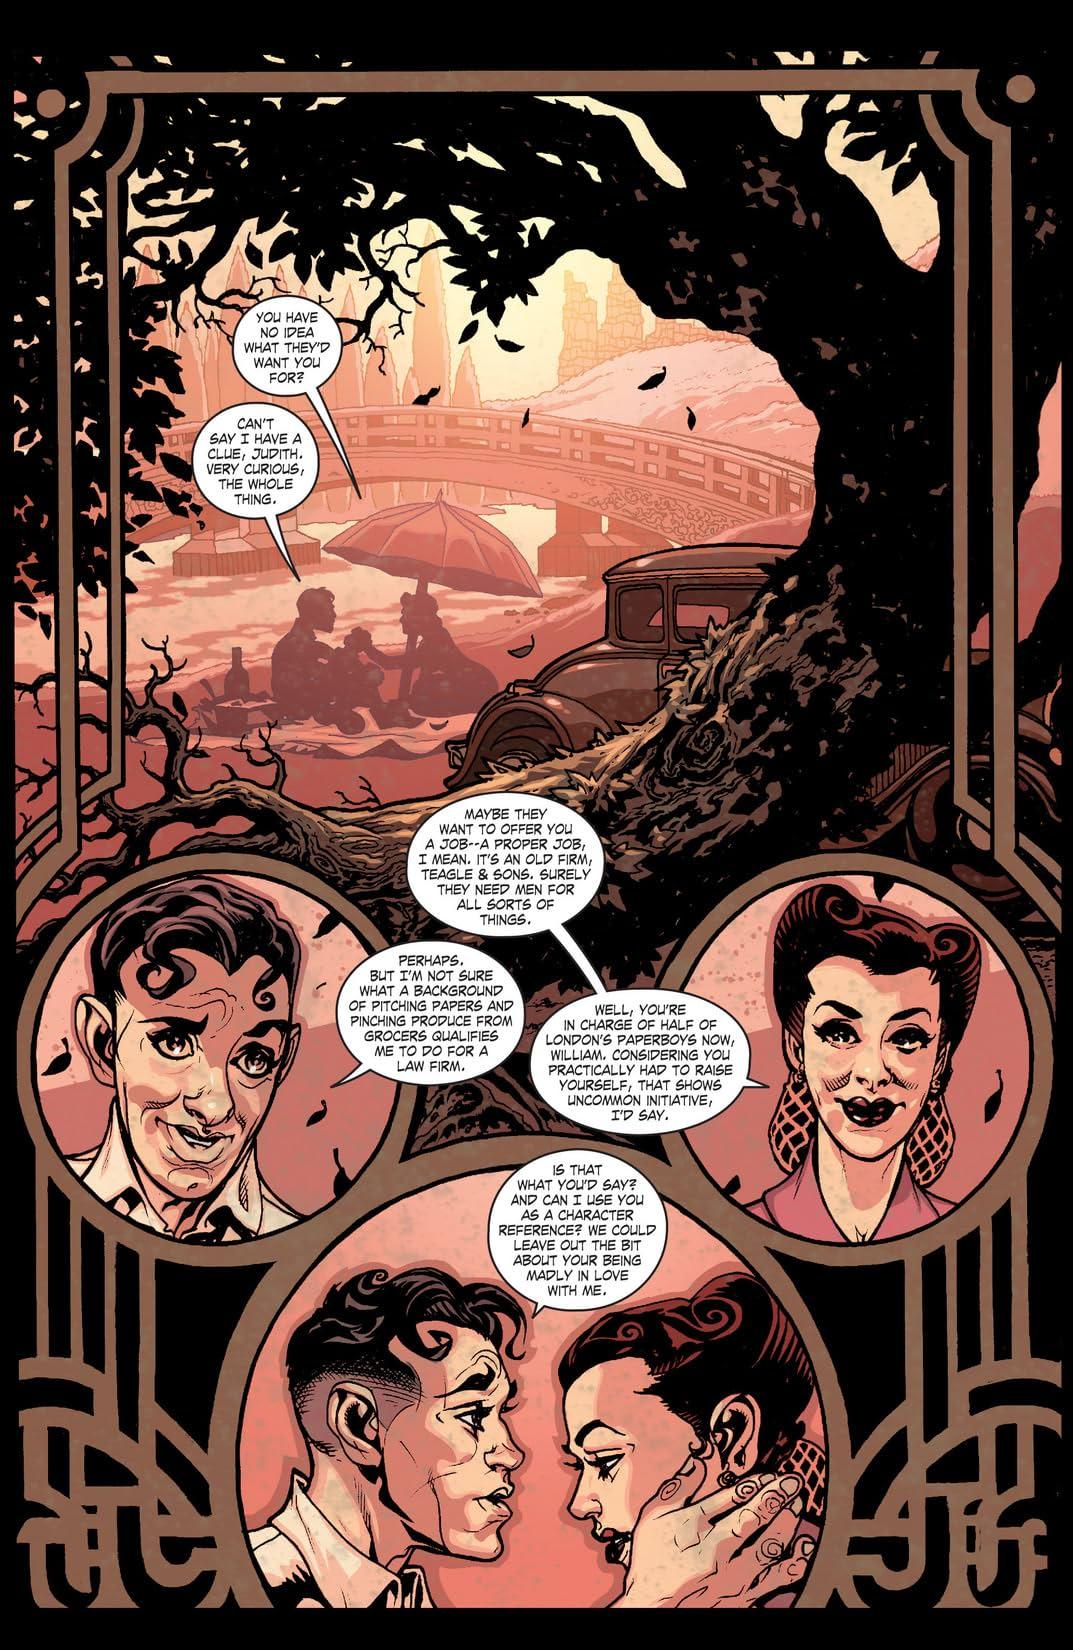 JSA Liberty Files: The Whistling Skull (2012) #3 (of 6)